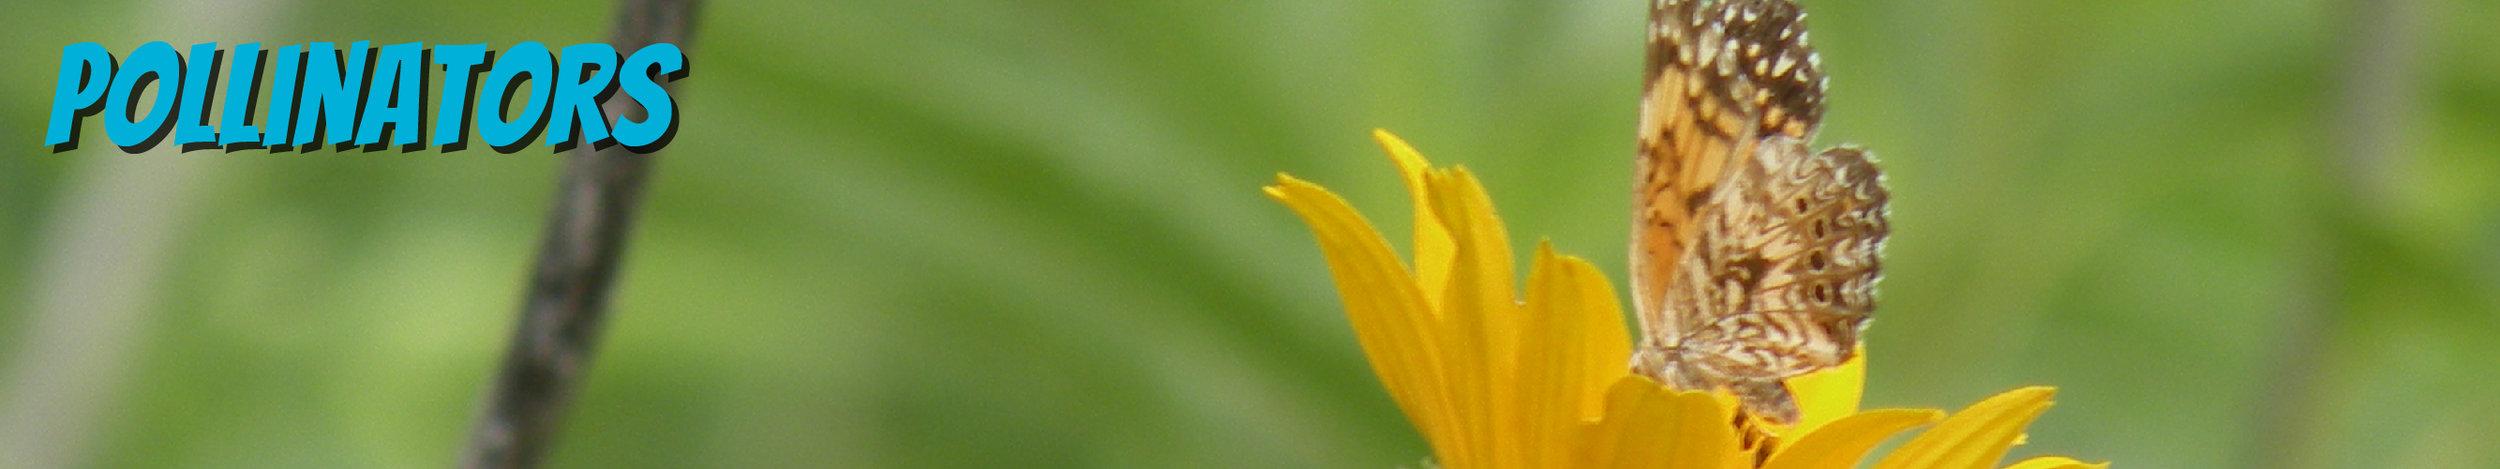 LATI-PollinatorsText-01.jpg